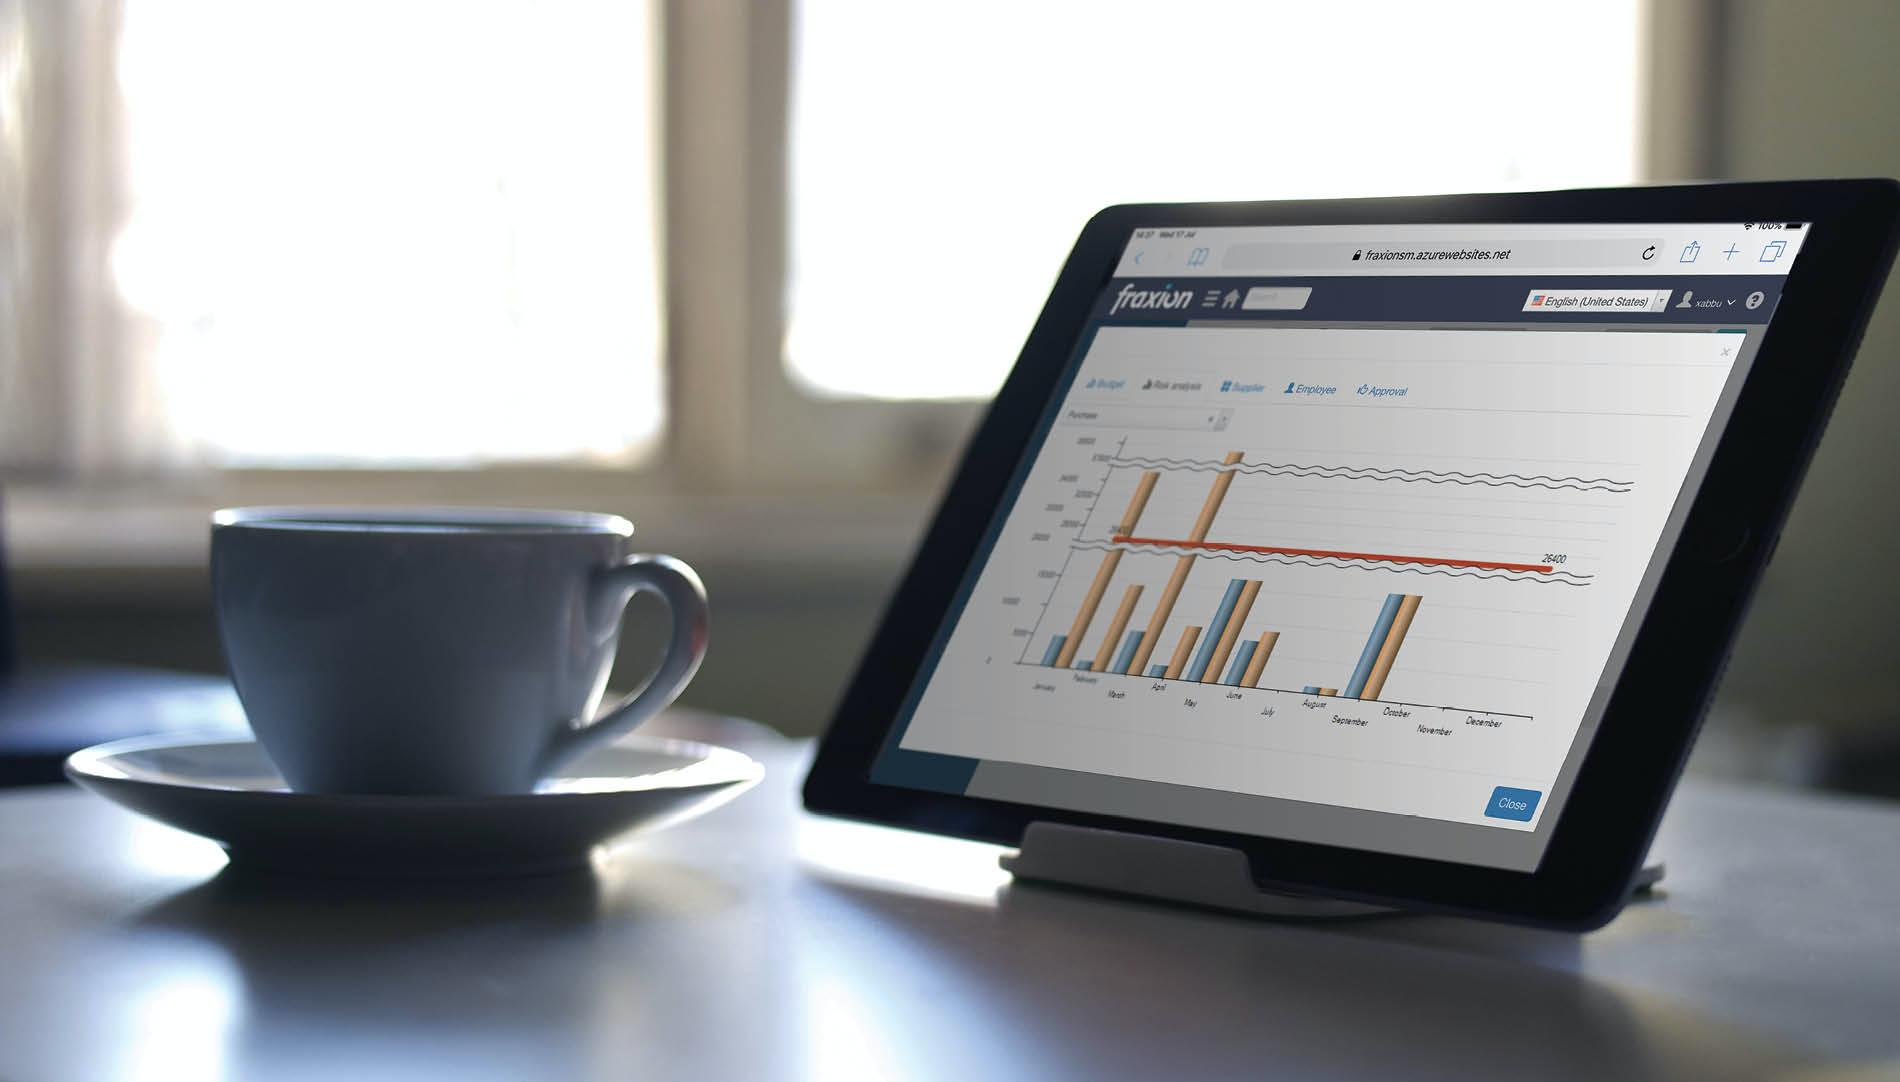 Advanced Business Intelligence tools